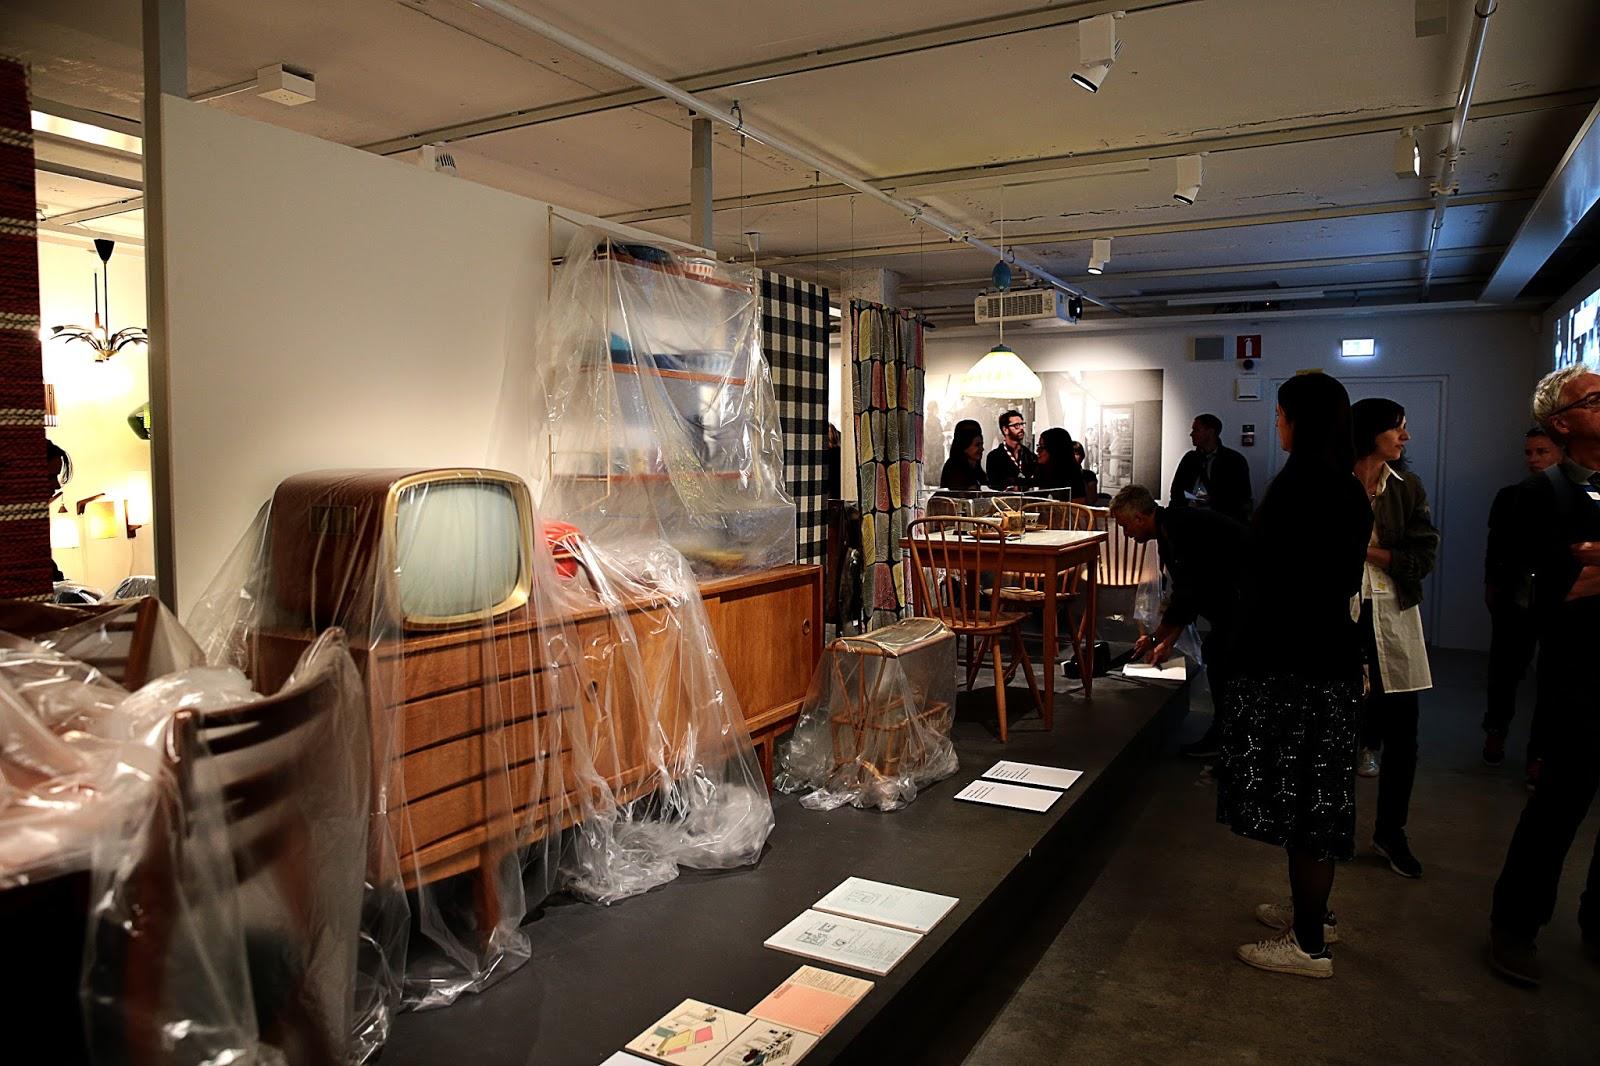 bruntes democracy larsbrundin lmhult ikea museum. Black Bedroom Furniture Sets. Home Design Ideas